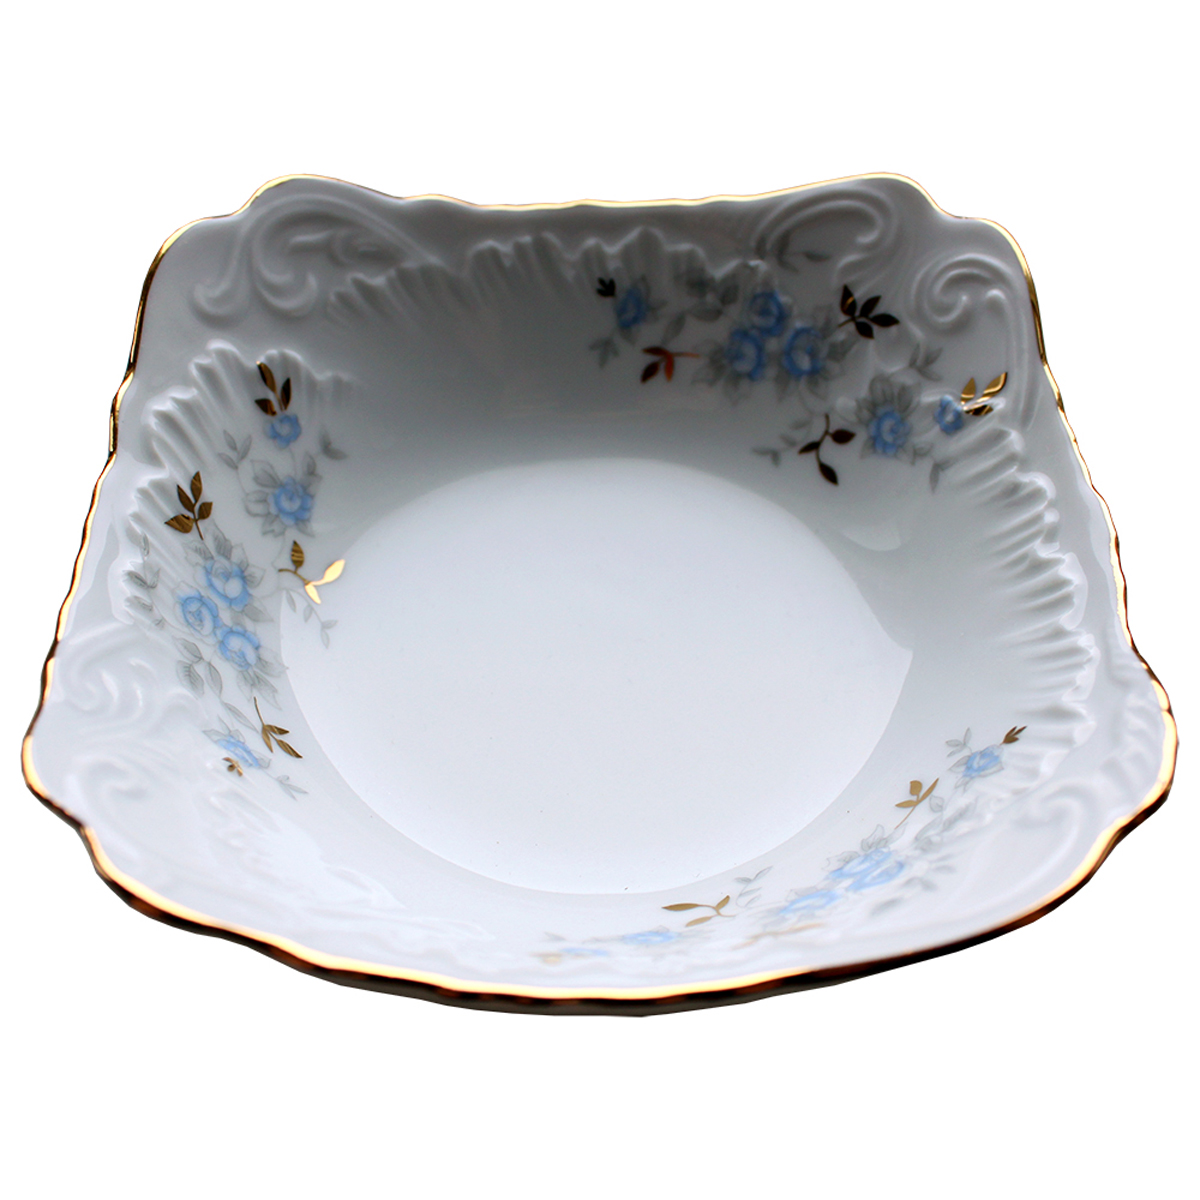 Фото - Салатник Cmielow Rococo. Голубой цветок, диаметр 14 см салатник 23 см мейсенский цветок